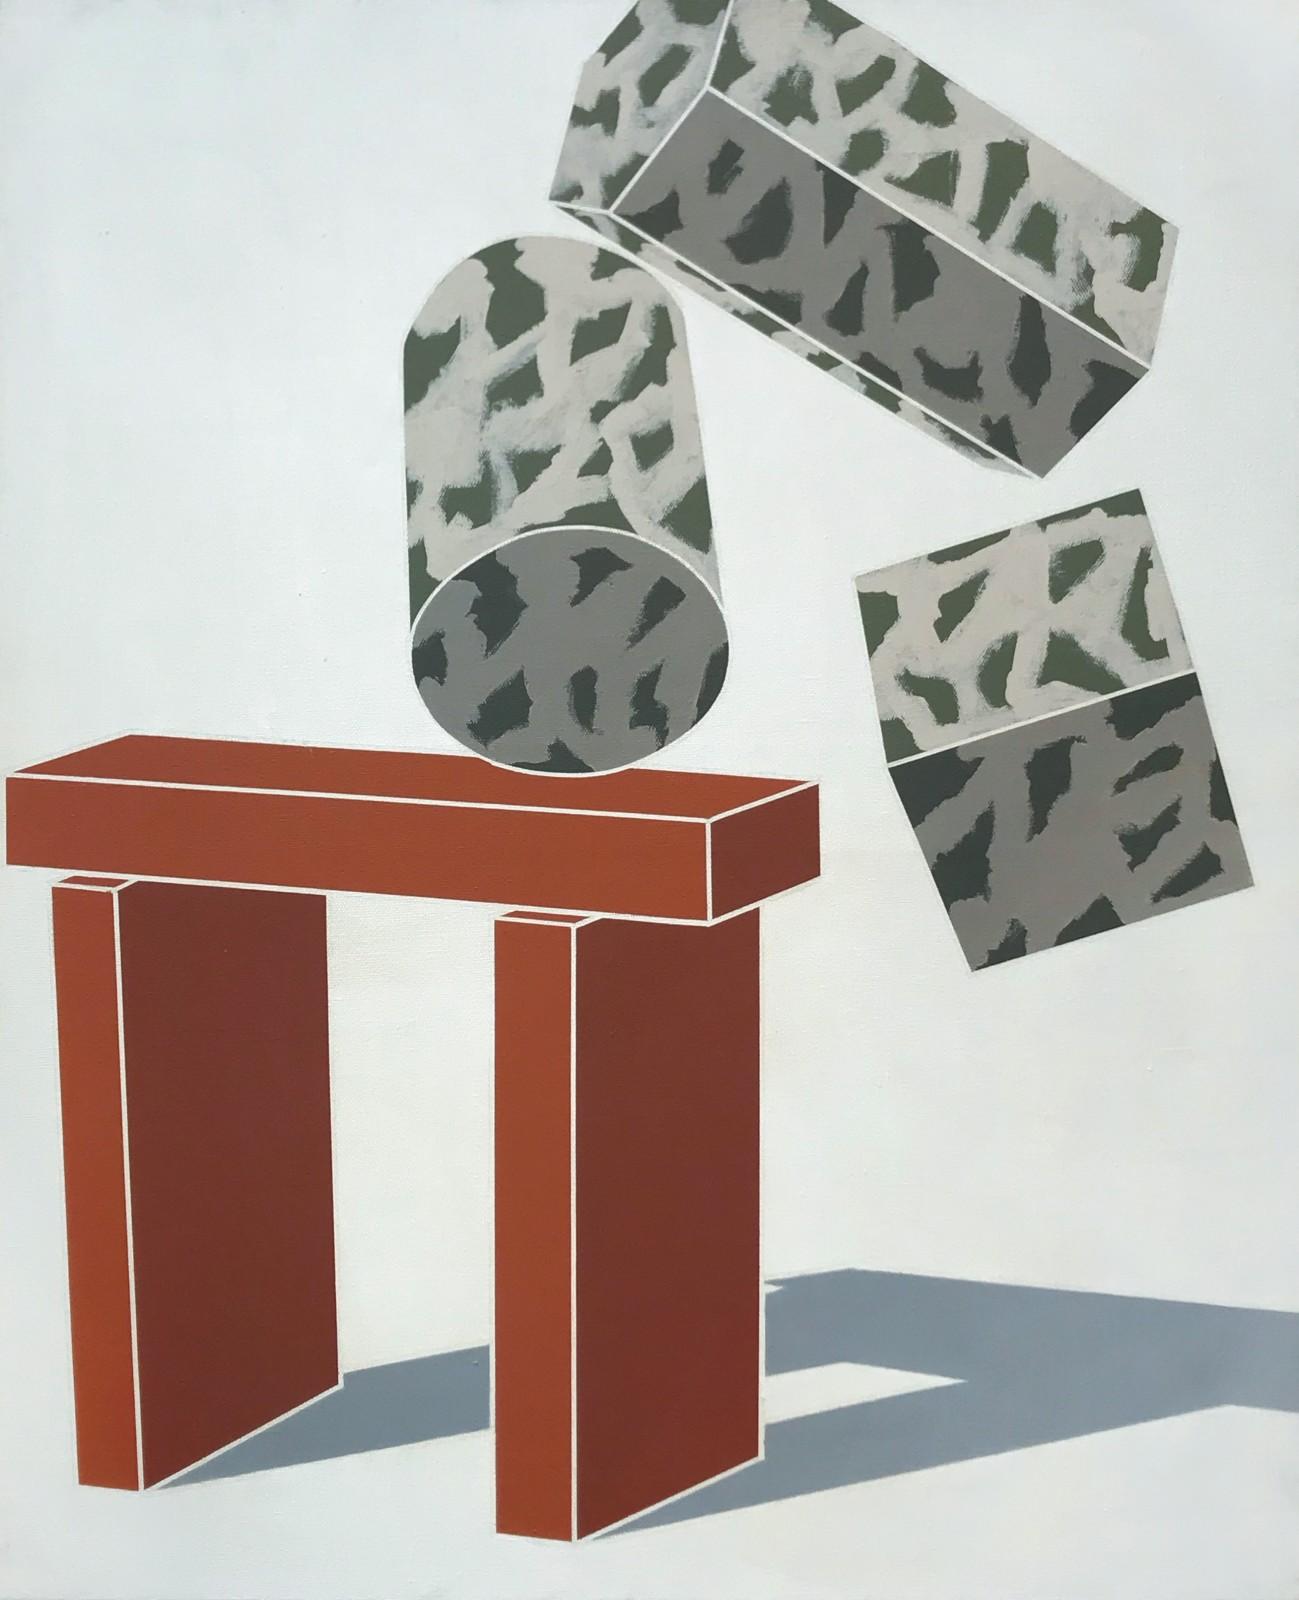 "<span class=""link fancybox-details-link""><a href=""/artists/228-emilio-tadini/works/11001/"">View Detail Page</a></span><div class=""artist""><span class=""artist""><strong>EMILIO TADINI</strong></span></div><div class=""title""><em>Paesaggio Occidentale / Western Landscape</em>, 1970</div><div class=""medium"">Acrylic on canvas</div><div class=""dimensions"">100 x 81 cm<br /> 39 ⅜ x 31 ⅞ inches</div>"